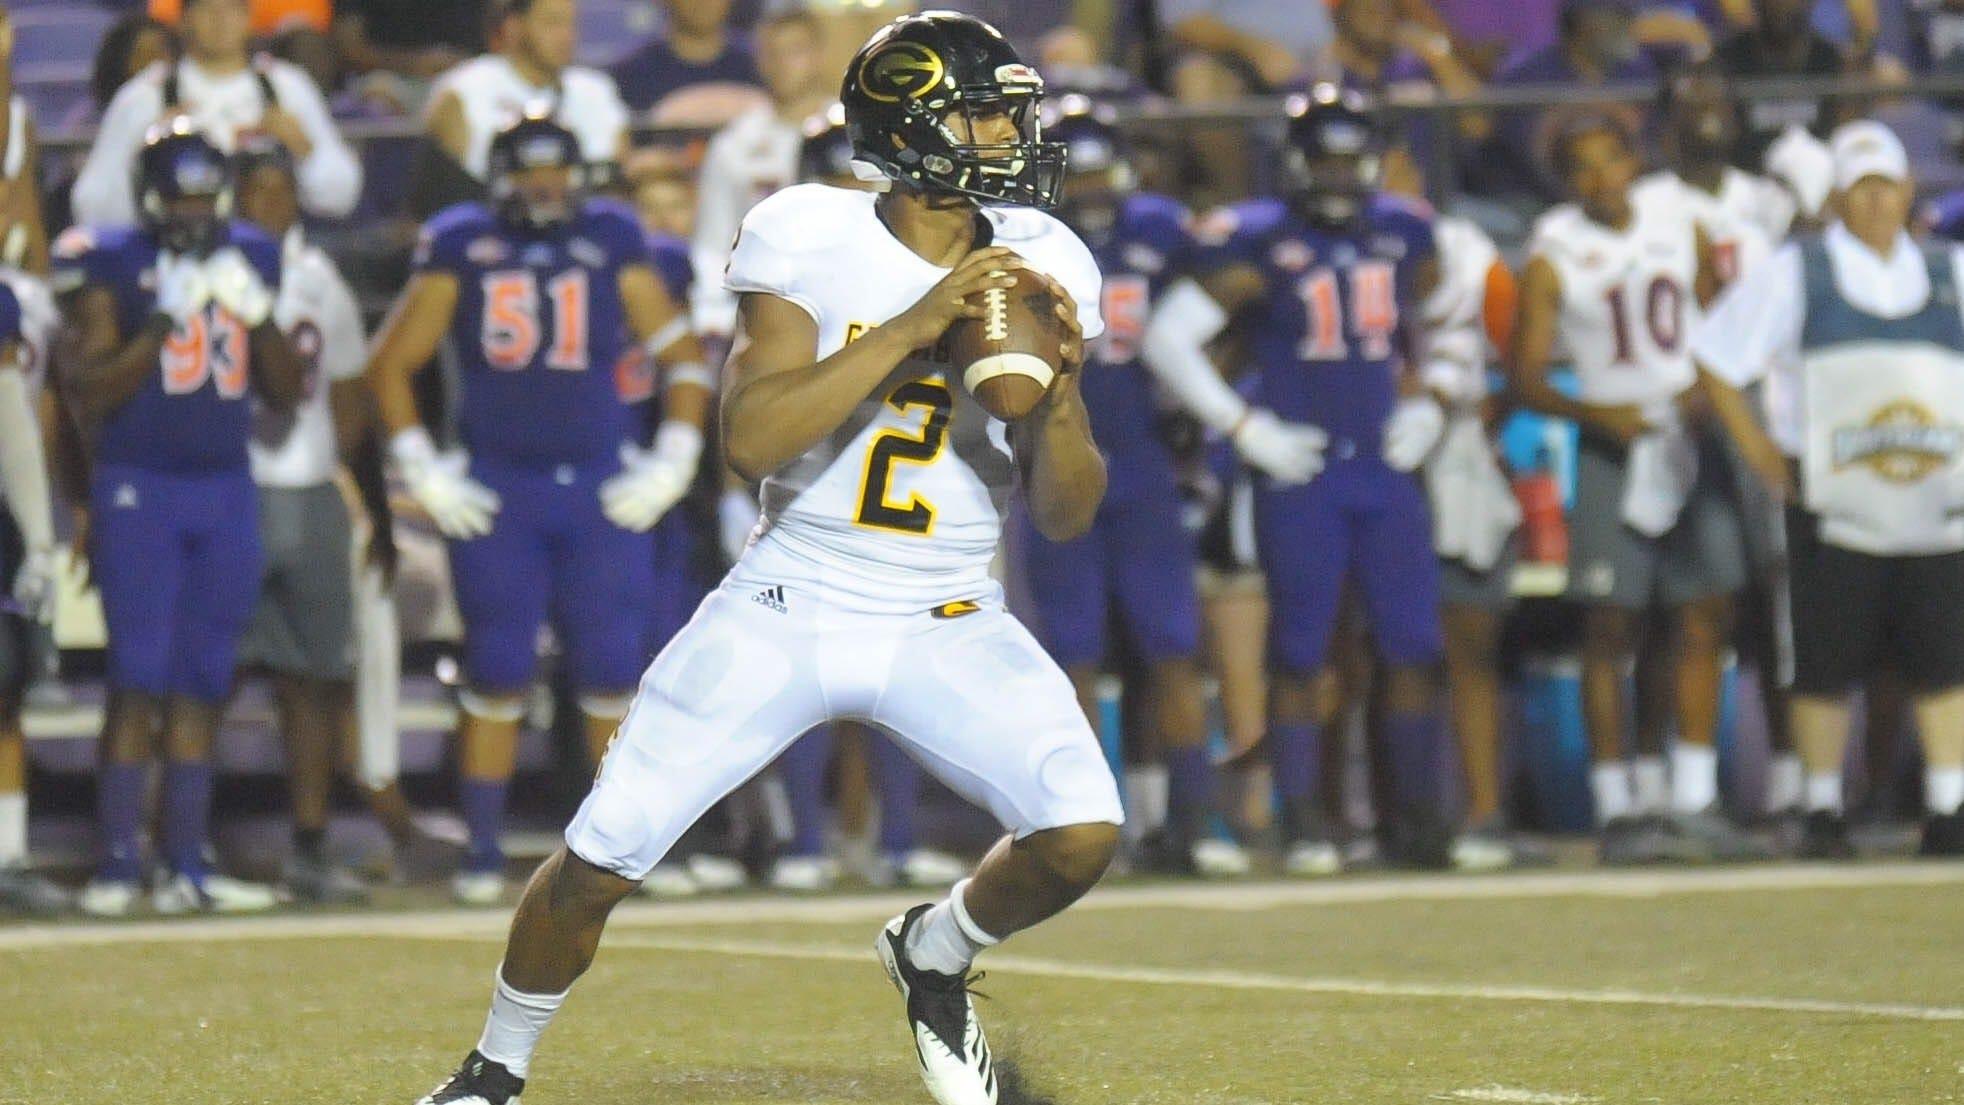 Grambling State redshirt freshman quarterback Aldon Clark (2) surveys the field against Northwestern State.